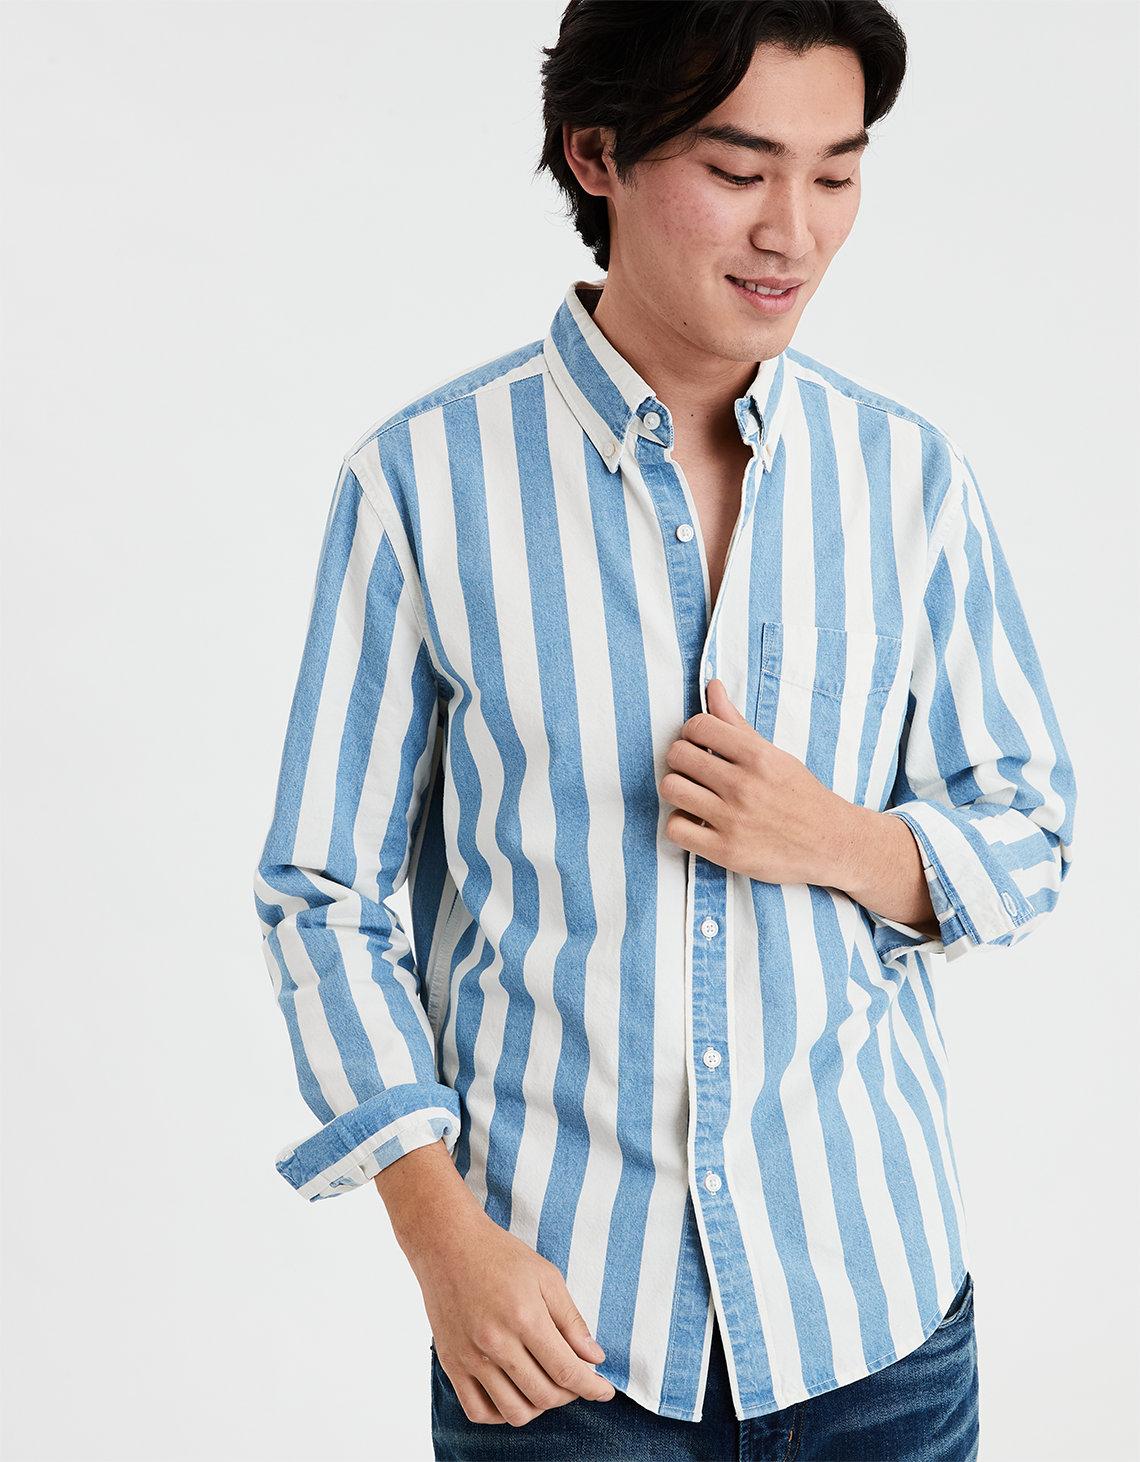 e6ea38849 AE Long Sleeve Striped Denim Button Down Shirt, Medium Vintage Wash ...